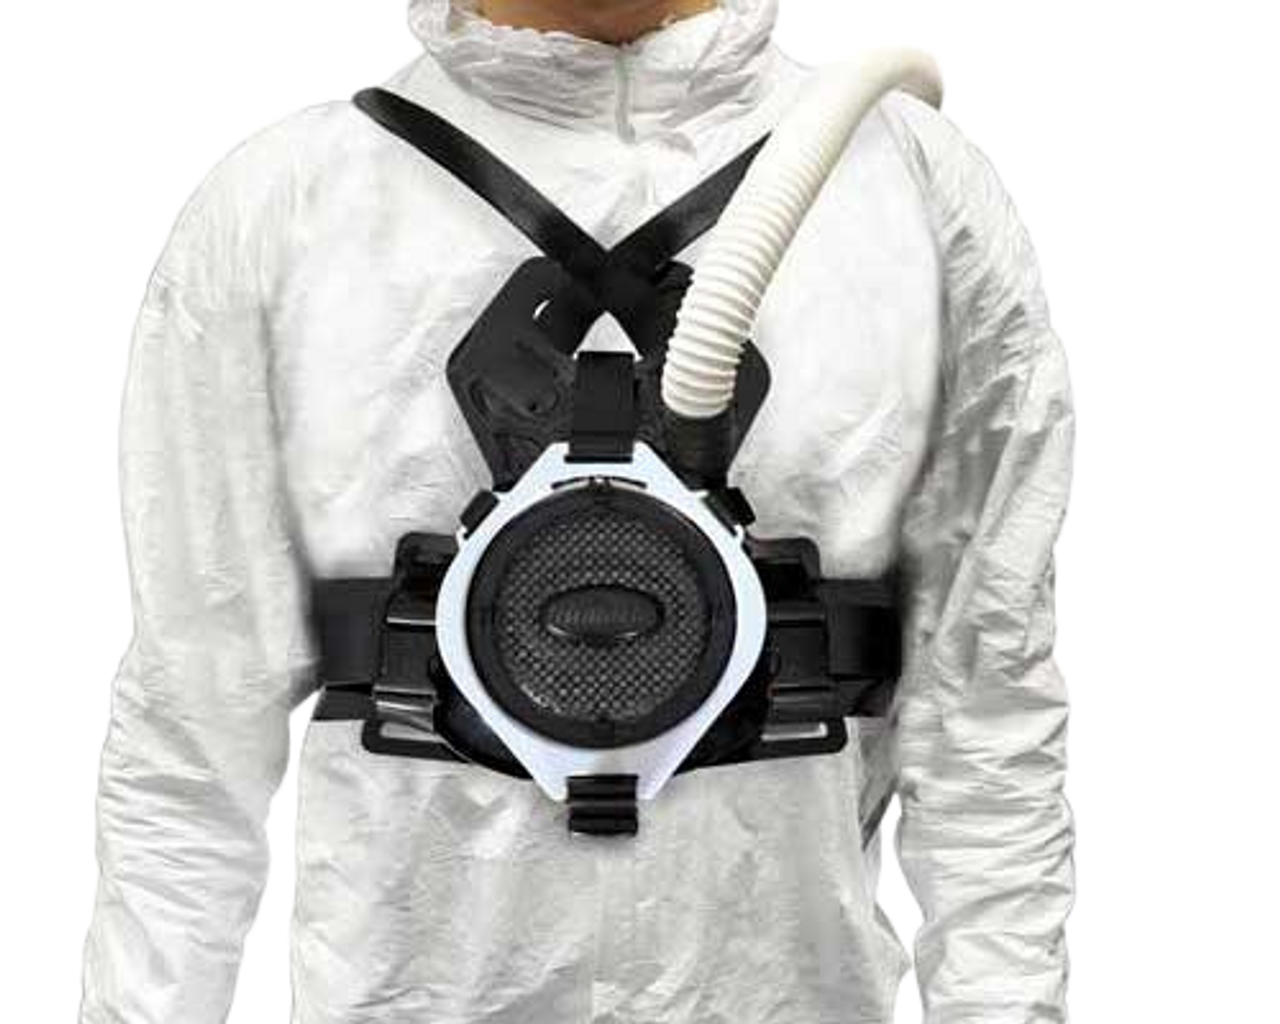 EBH Backpack for EVA PAPR